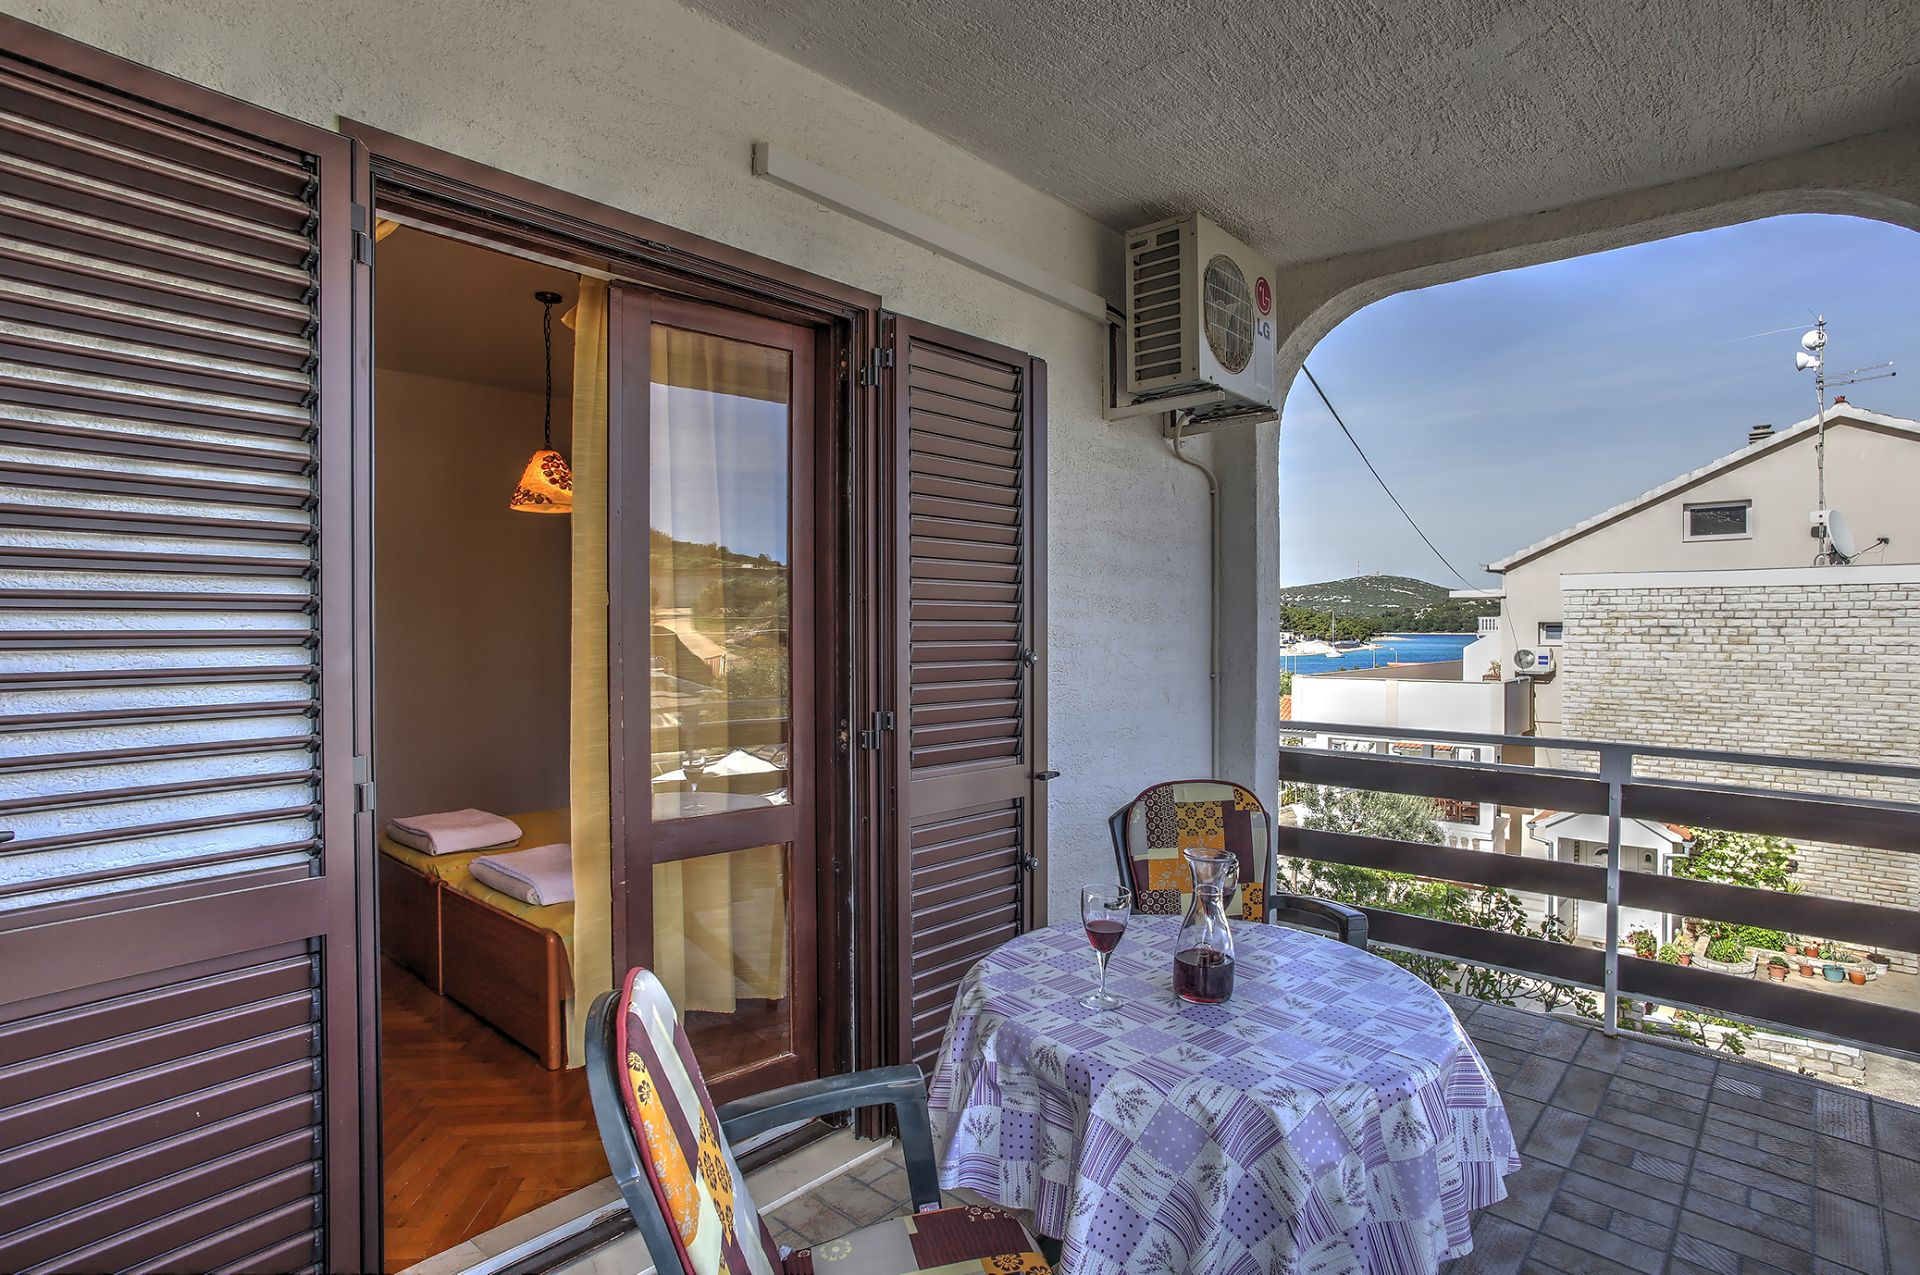 5409 - Jezera - Apartments Croatia - SA4(2): terrace